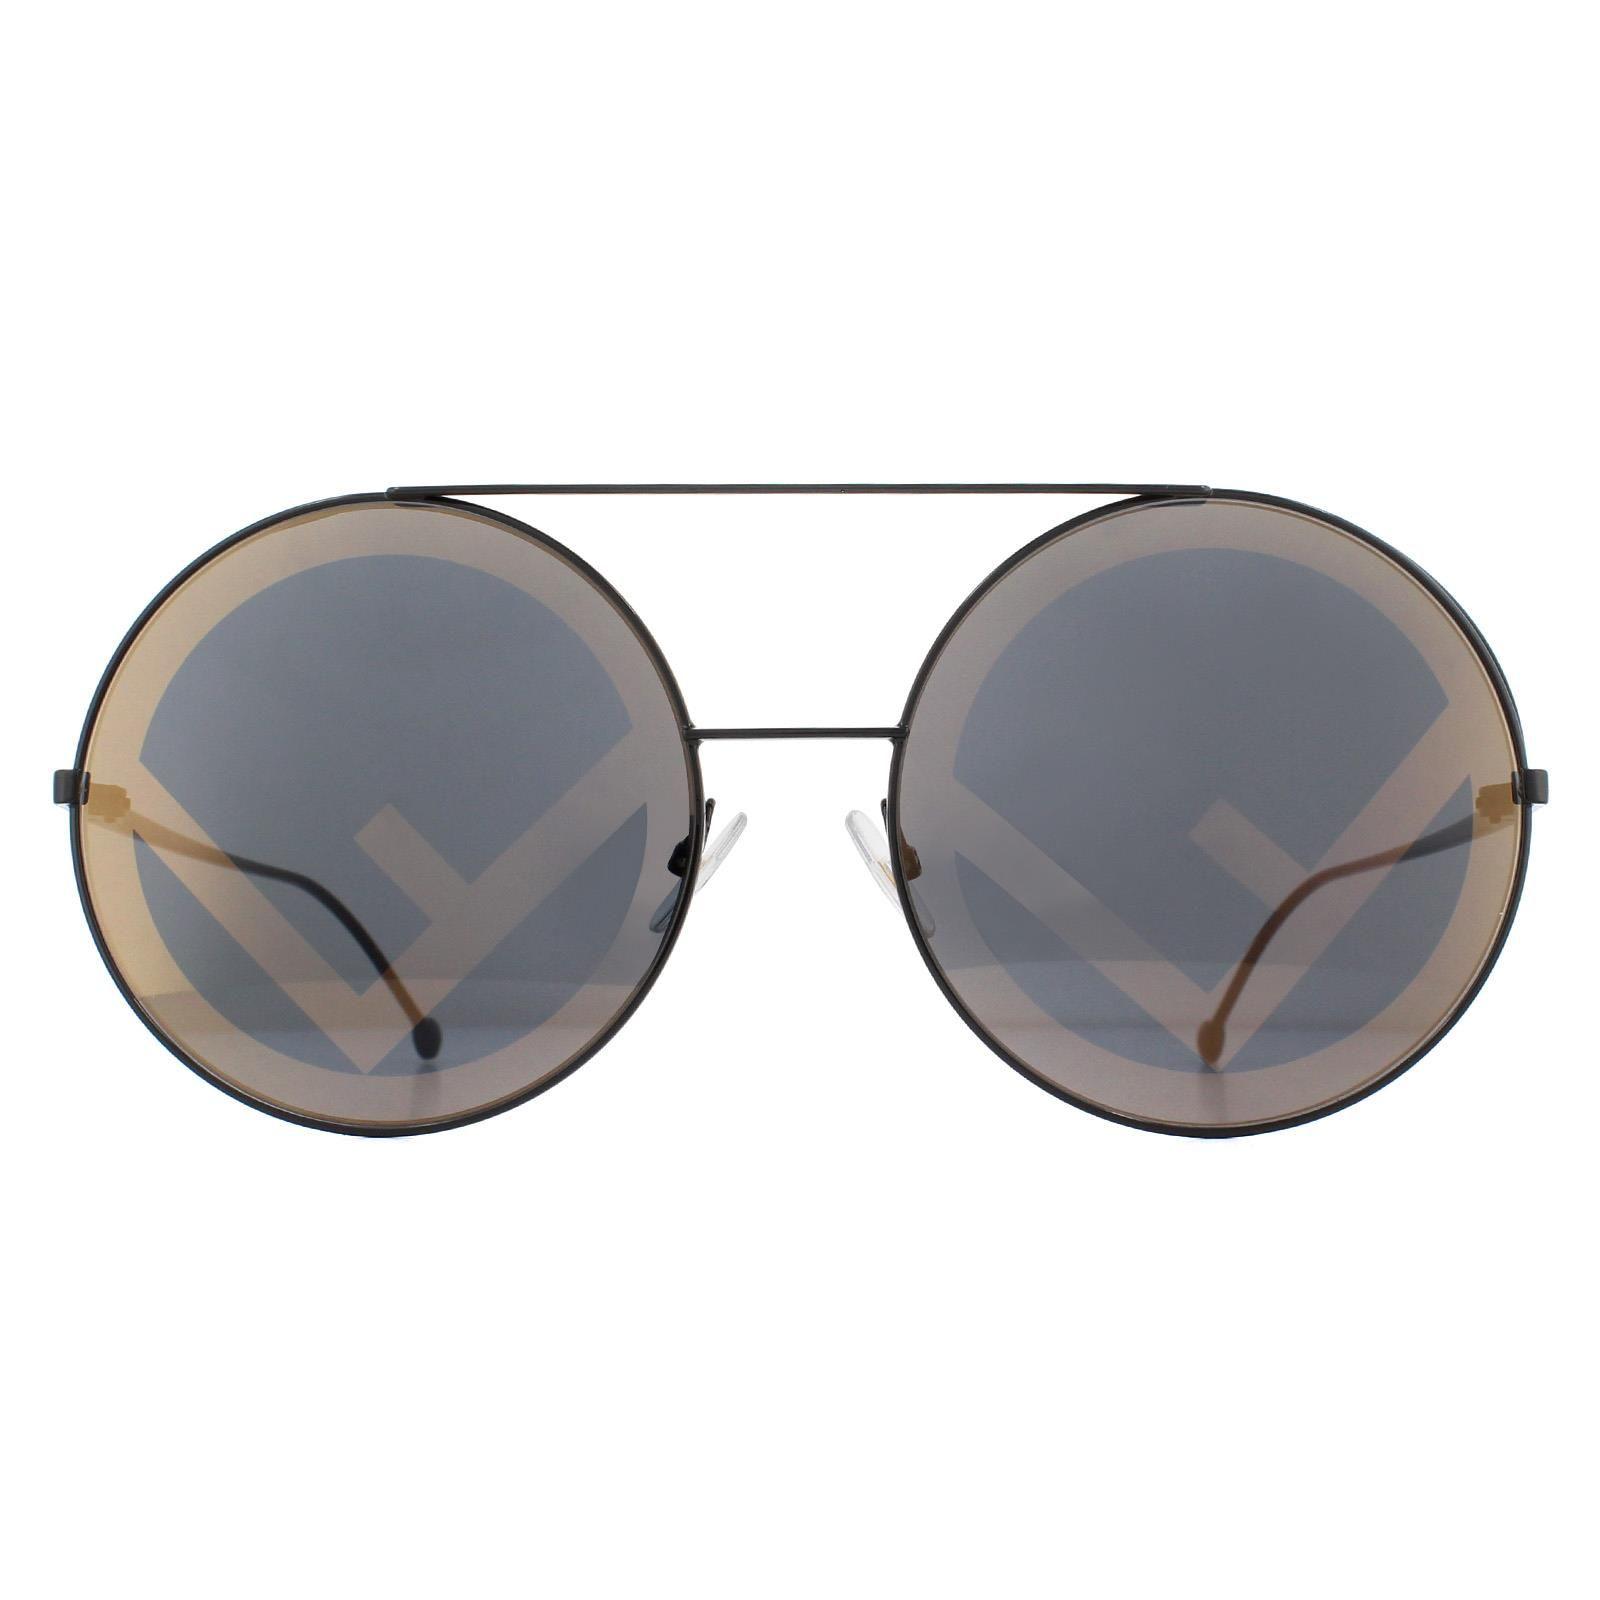 Fendi Sunglasses FF 0285/S 807/7Y Black Grey with Gold Monogram